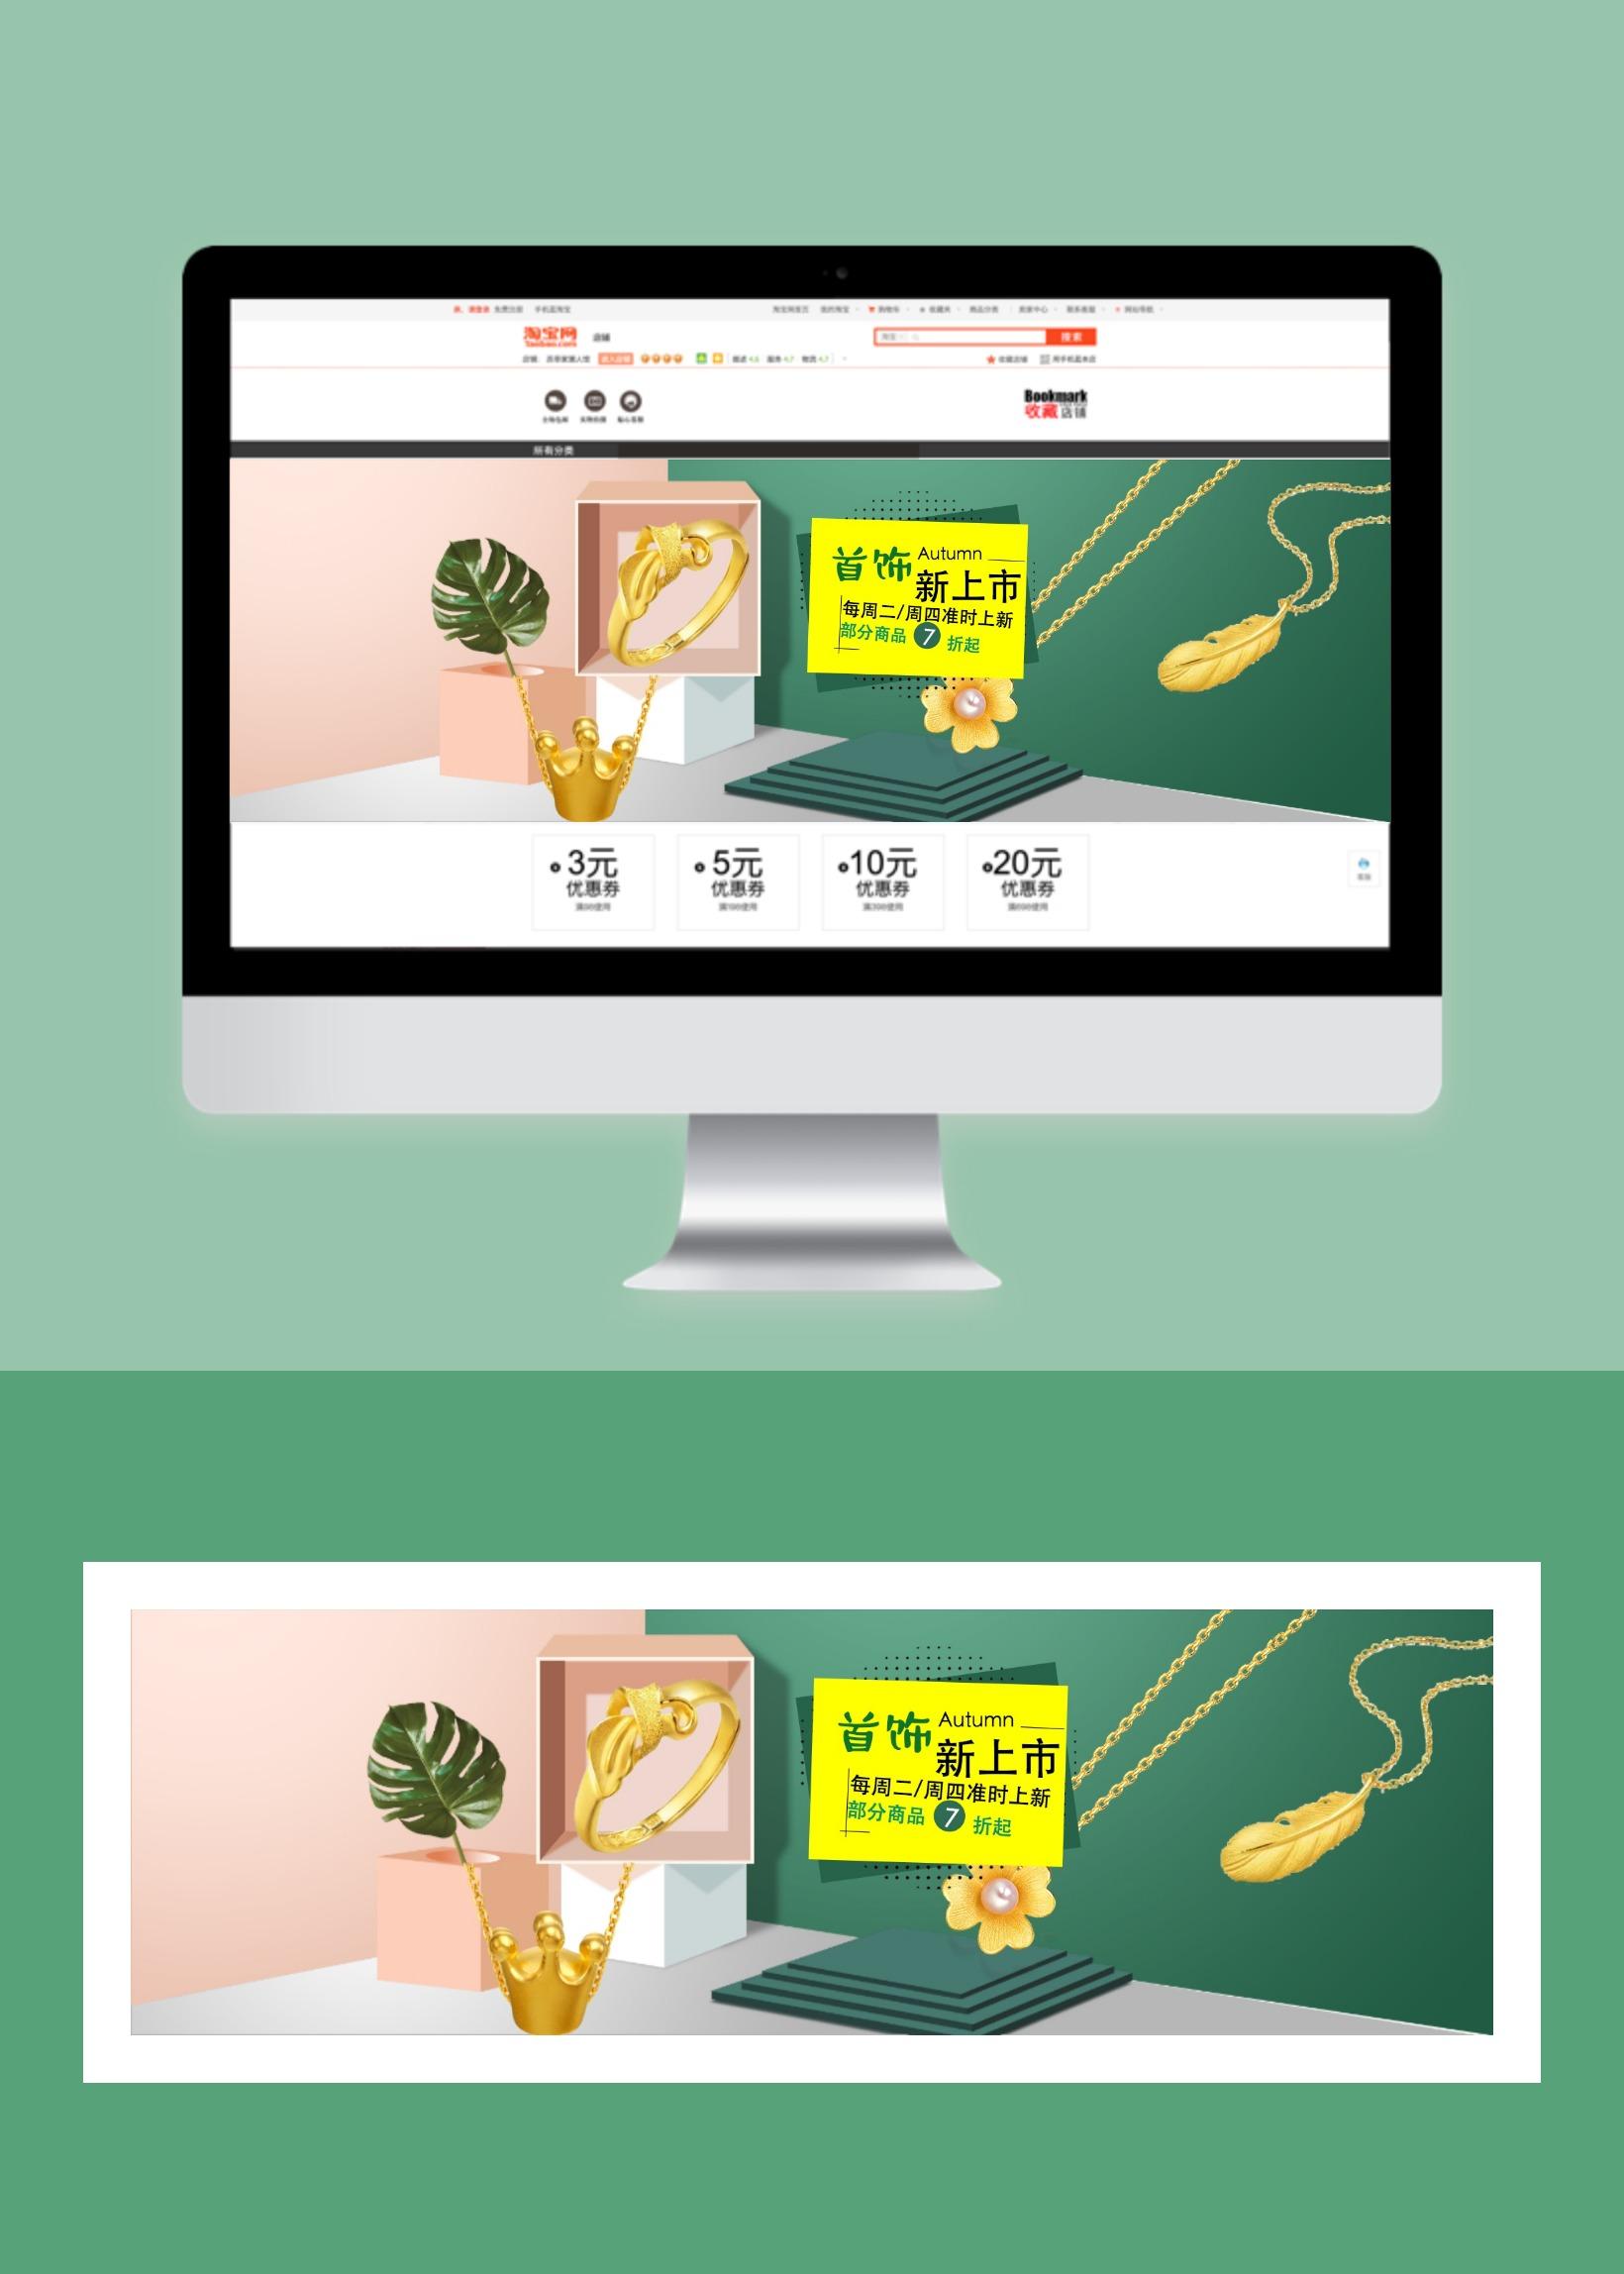 时尚精品首饰珠宝折扣电商banner